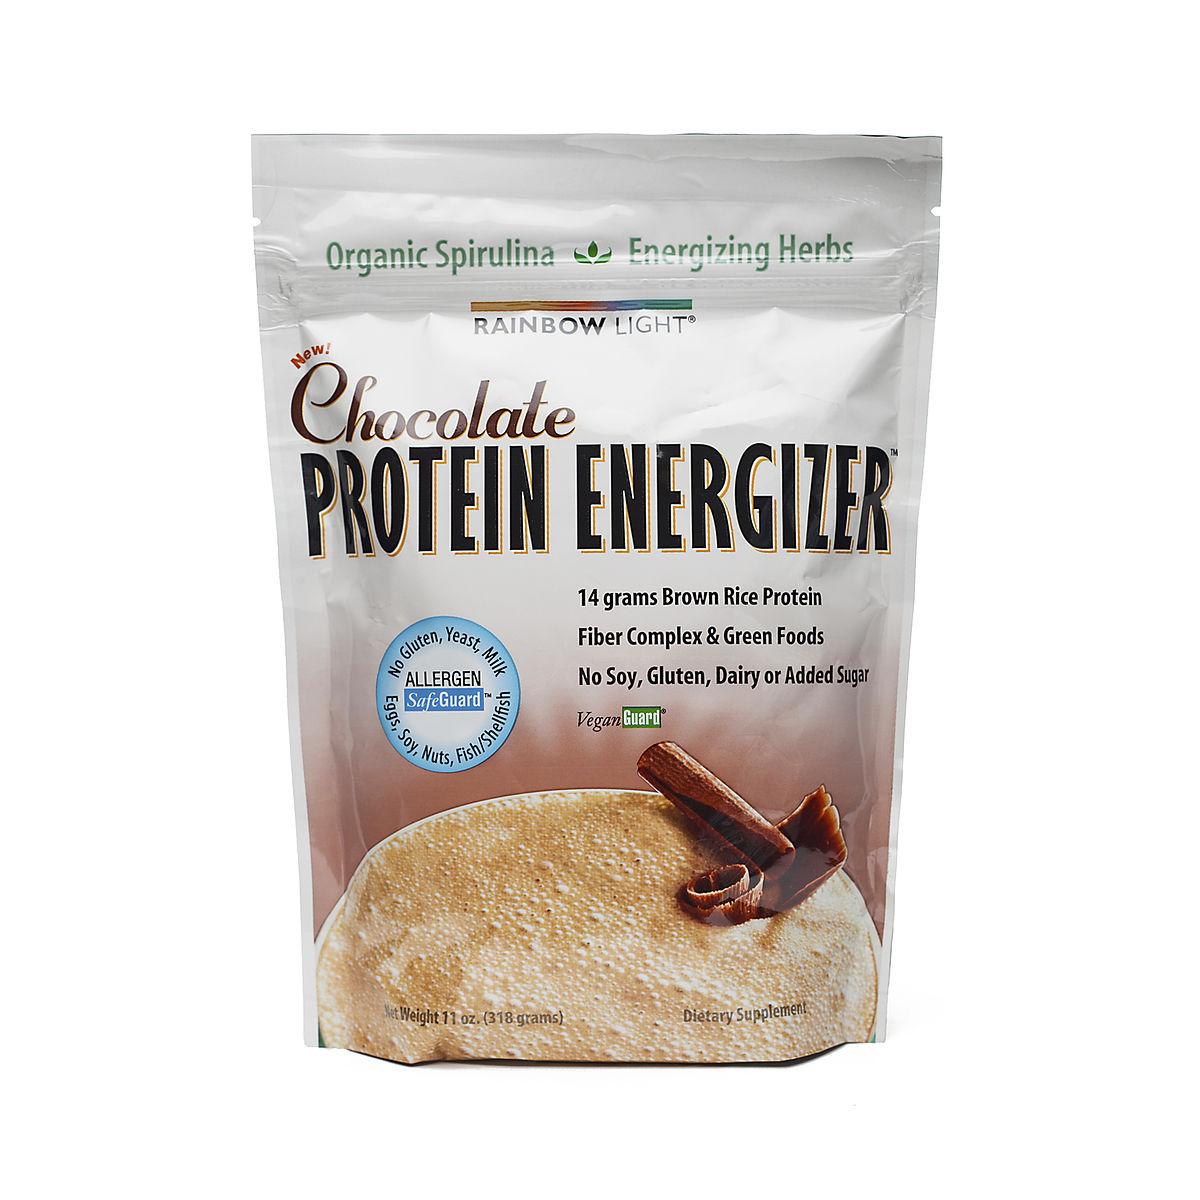 rainbow light protein energizer powder chocolate thrive market. Black Bedroom Furniture Sets. Home Design Ideas